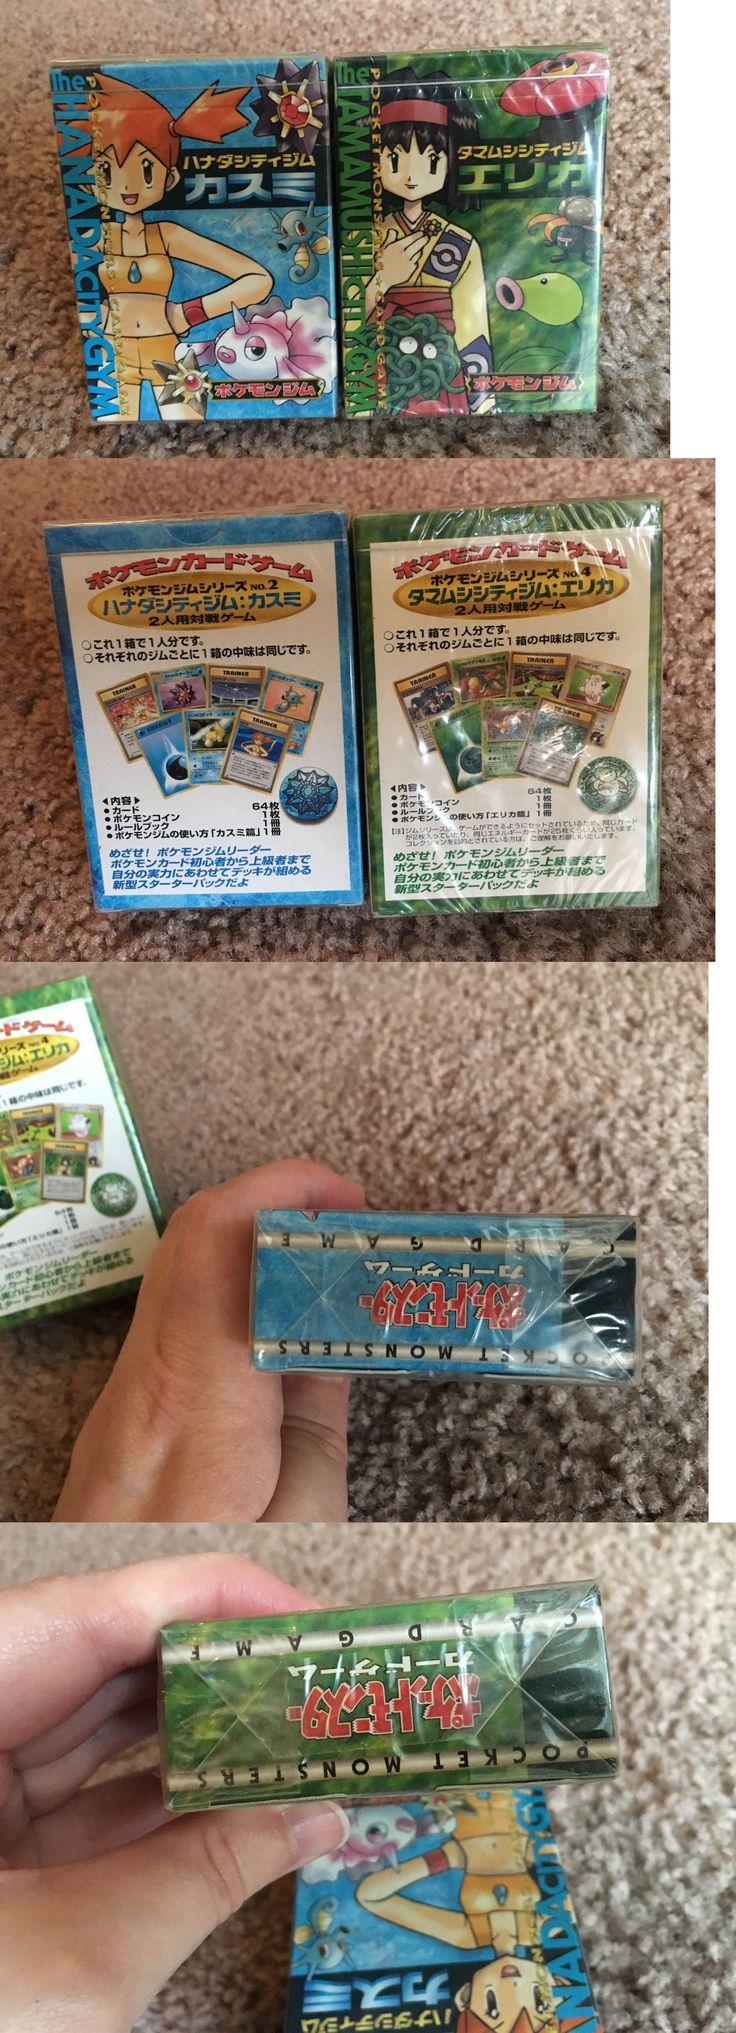 Pok mon Sealed Decks and Kits 183467: Hanada City Gym And Tamamushi City Gym Japanese Pokemon Theme Decks Factory Sealed -> BUY IT NOW ONLY: $130 on eBay!